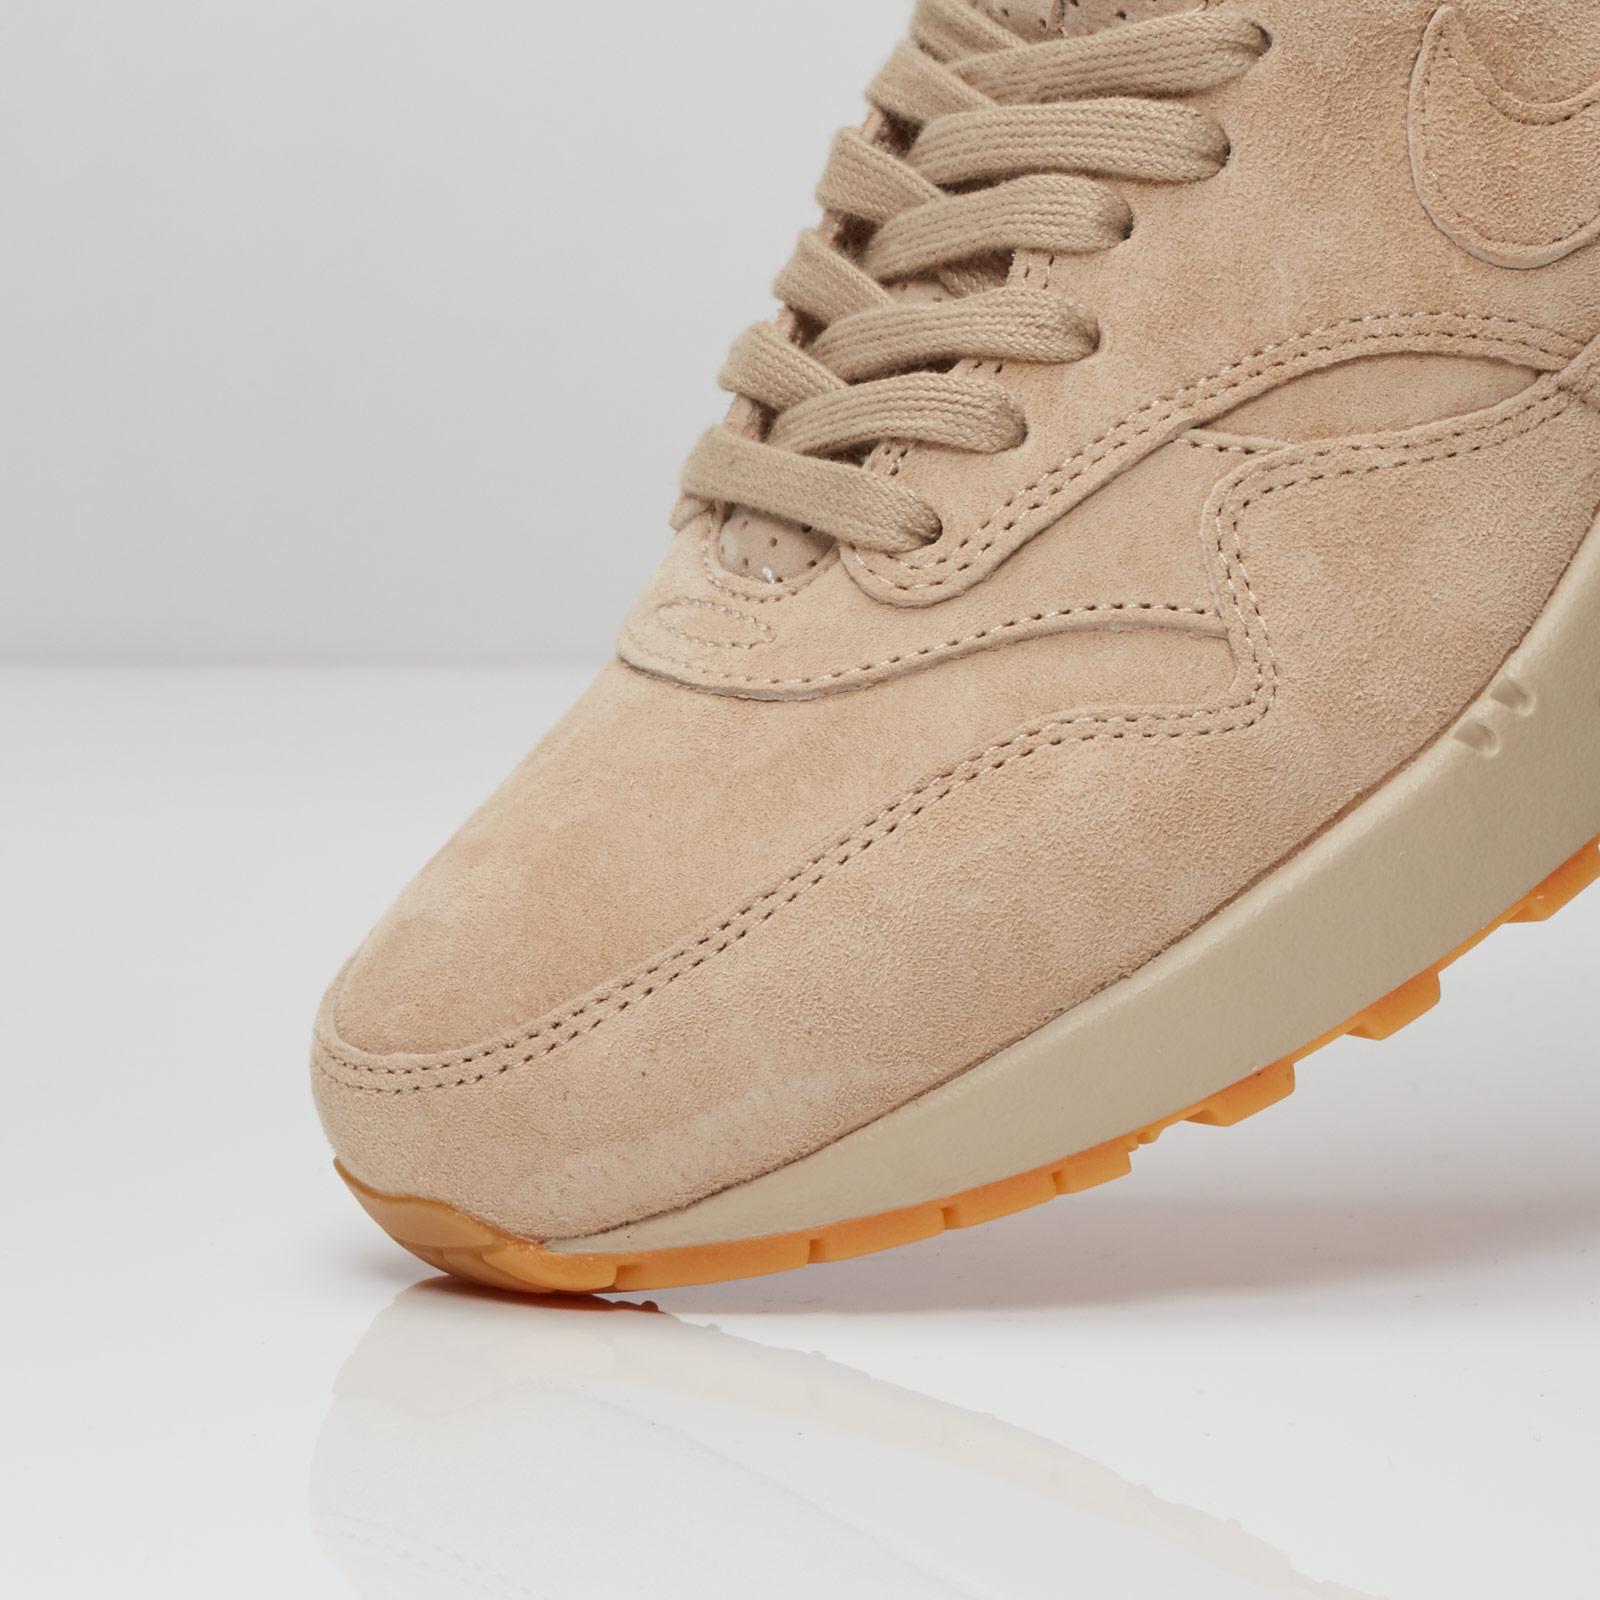 517b4fb5fc Nike Wmns Air Max 1 Pinnacle - 839608-200 - Sneakersnstuff ...